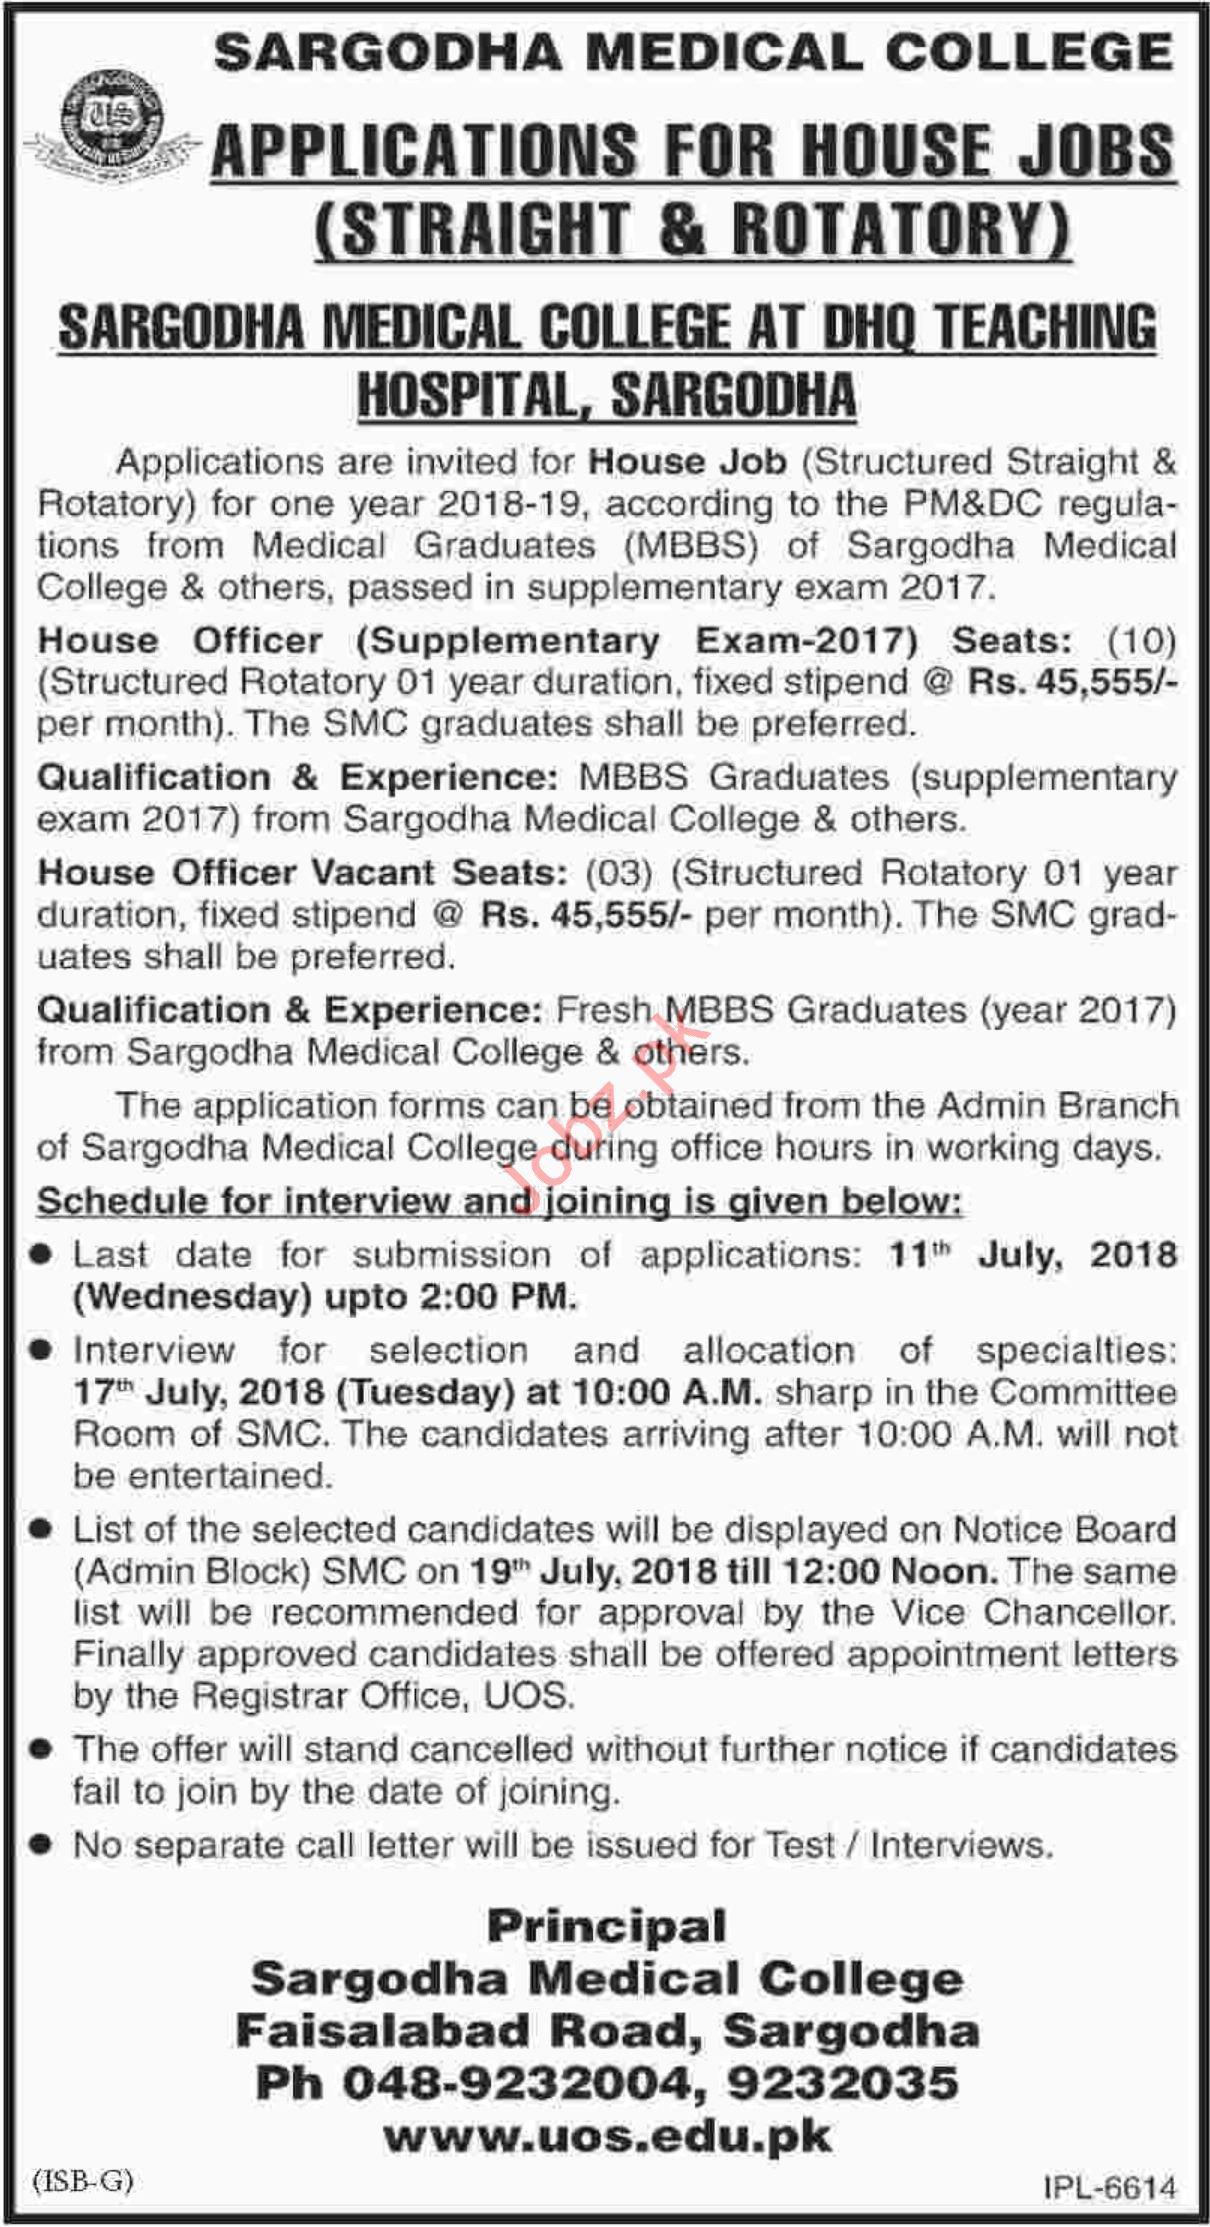 Sargodha Medical College House Jobs 2018